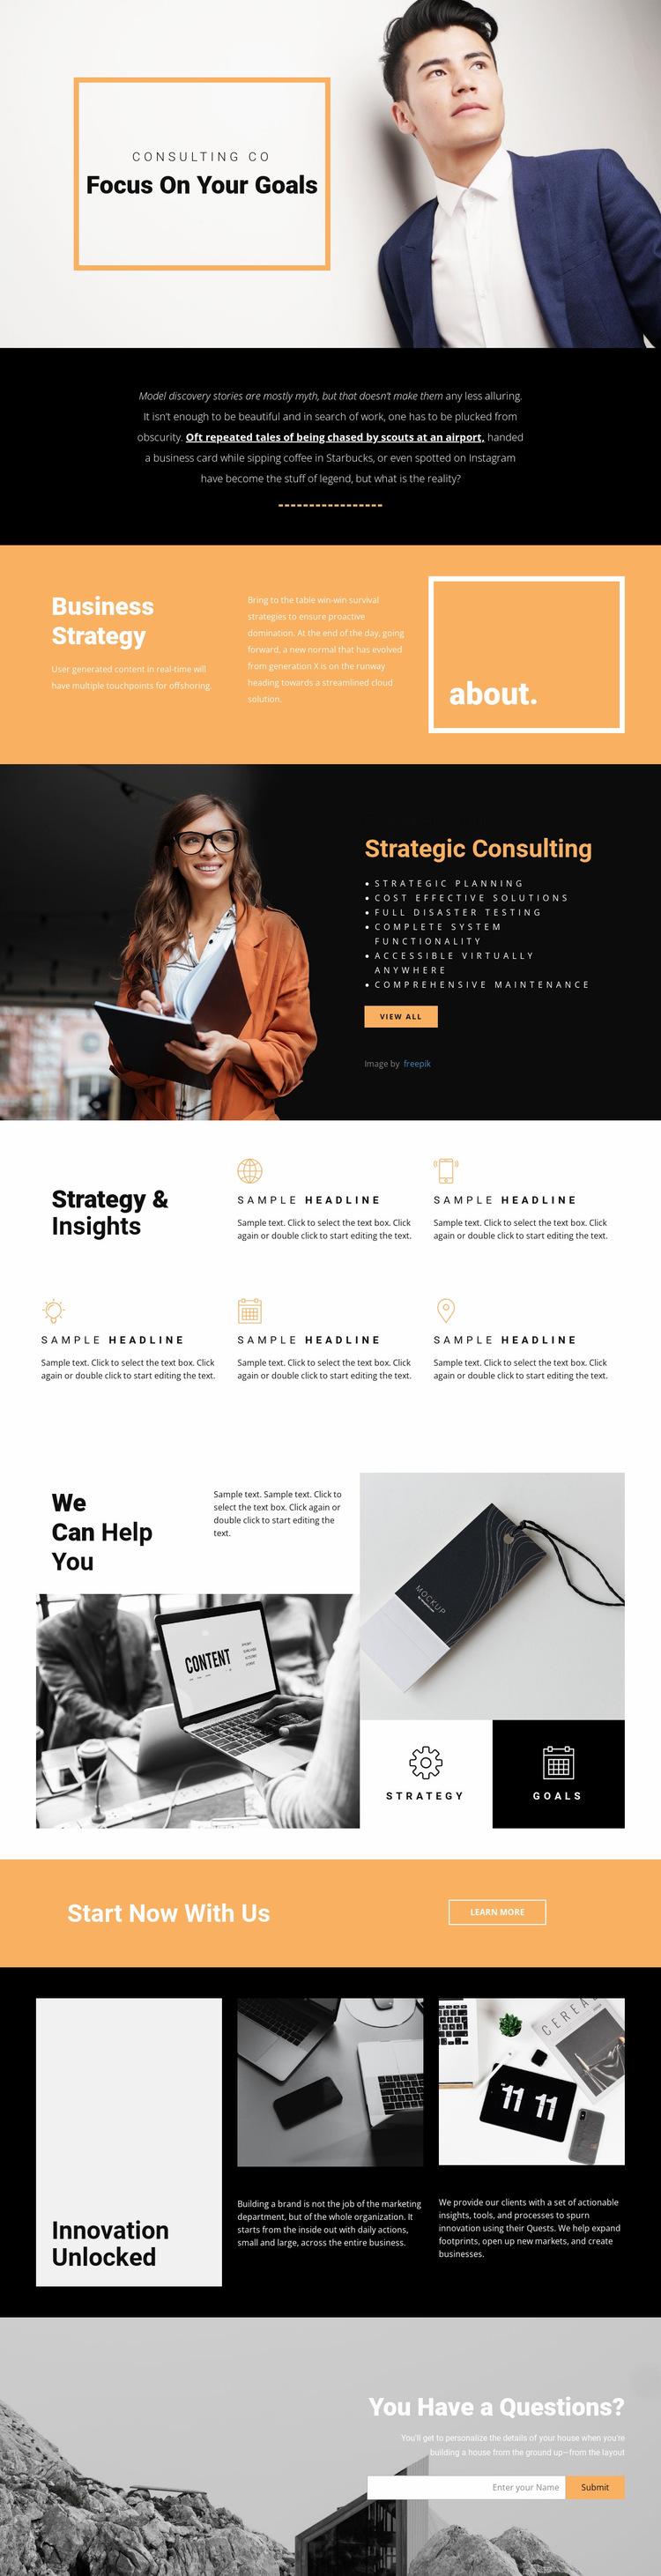 Goals for modern business  Website Builder